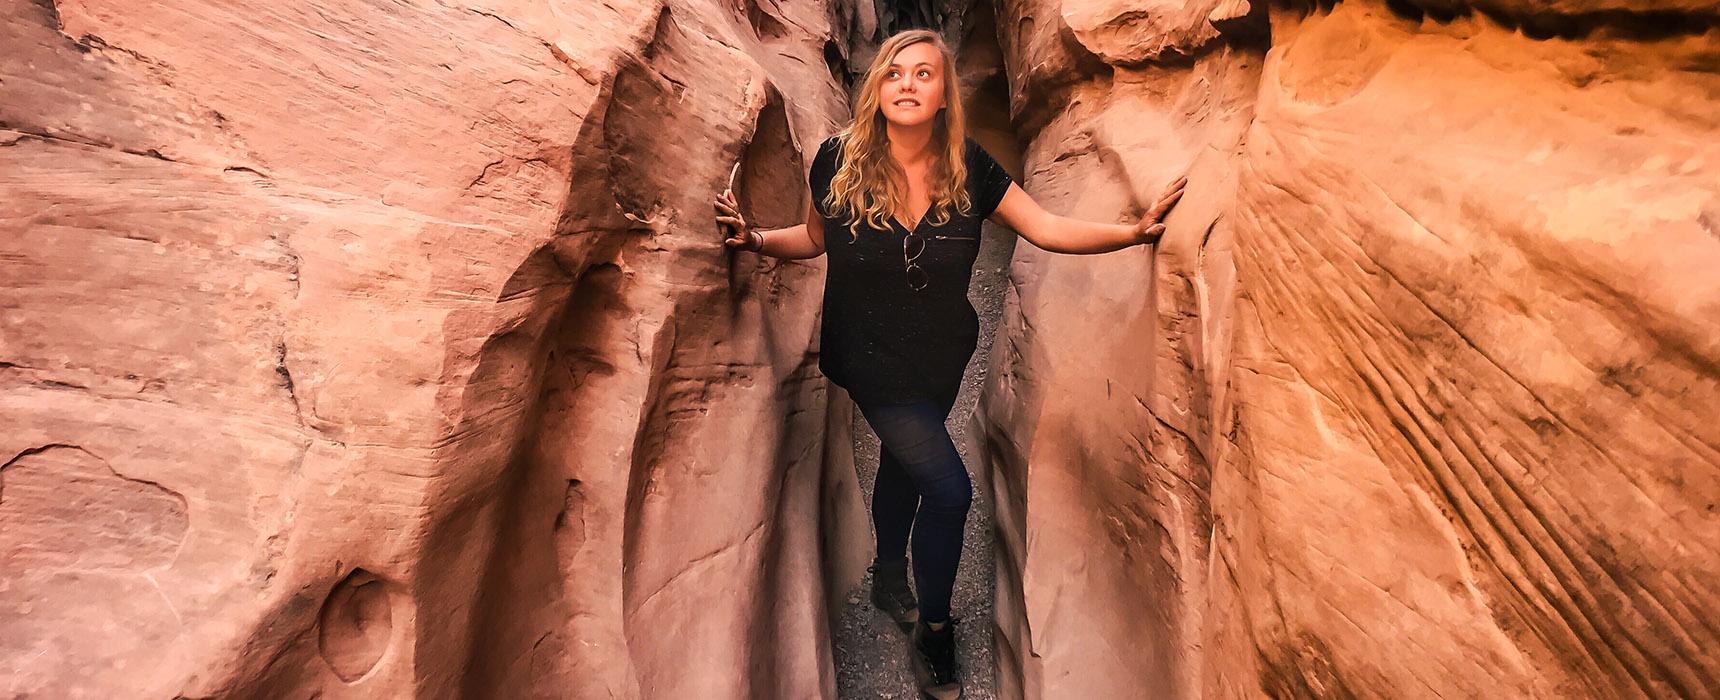 Little Wild Horse Canyon slot canyon utah randonnée usa road trip